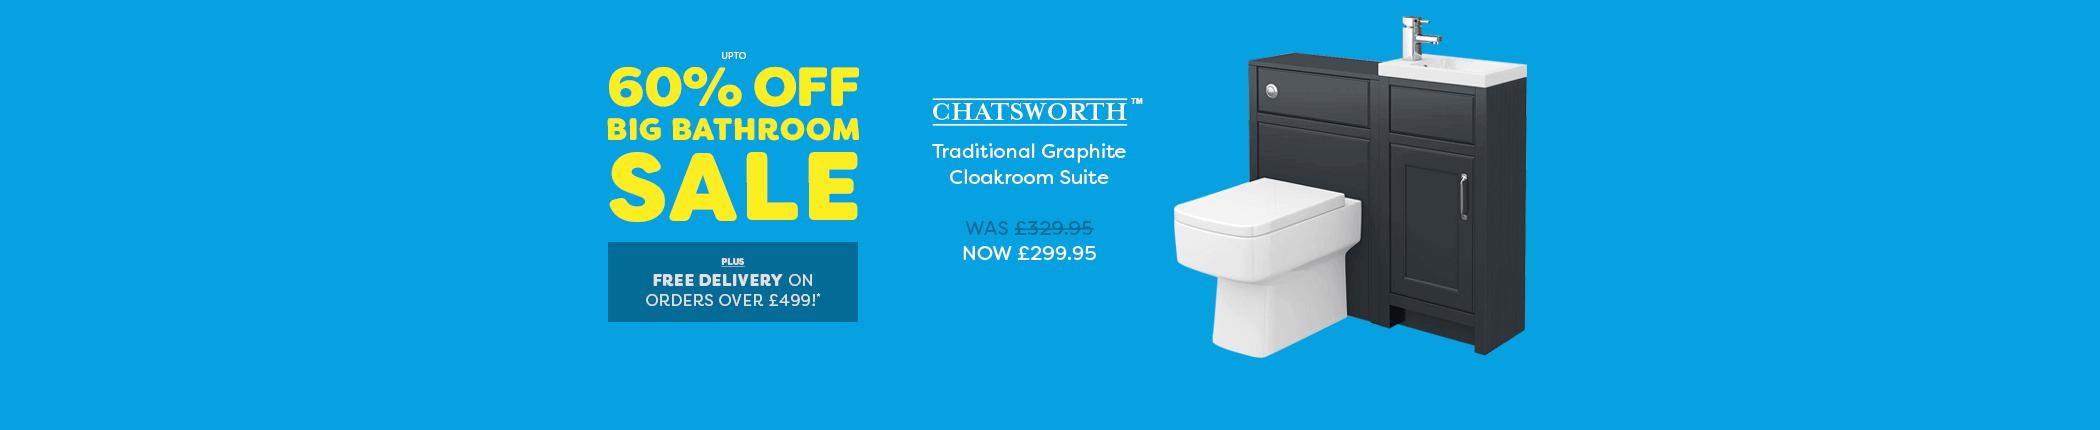 big-bathroom-sale-chatsworth-traditional-graphite-may17-hbnr